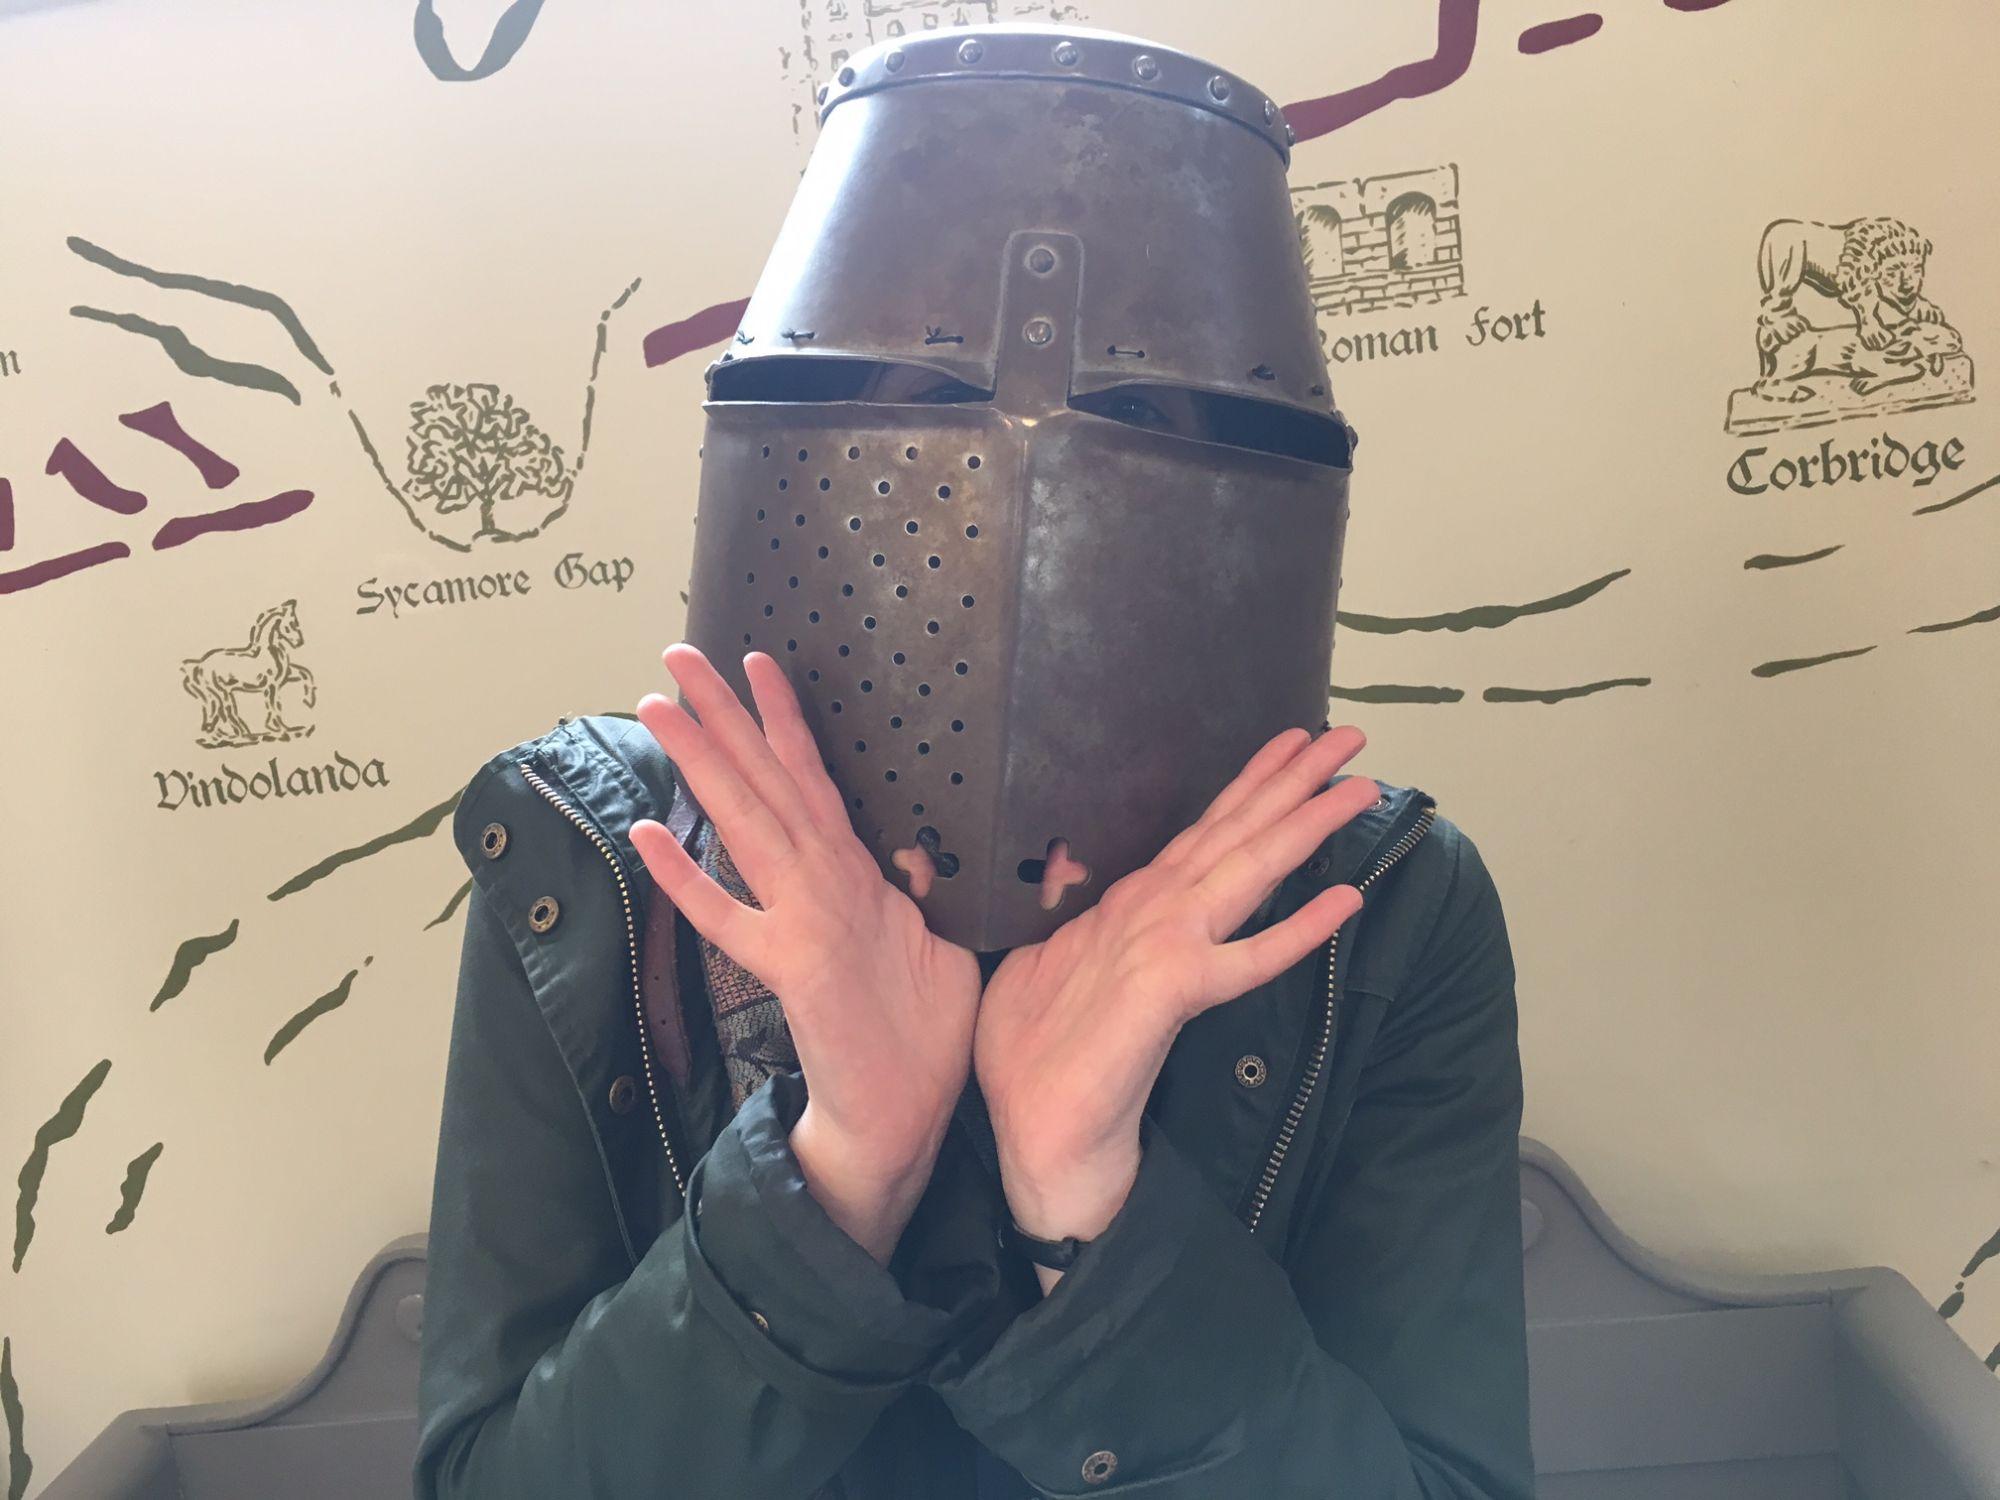 The Dork Knight (at Lanercost)